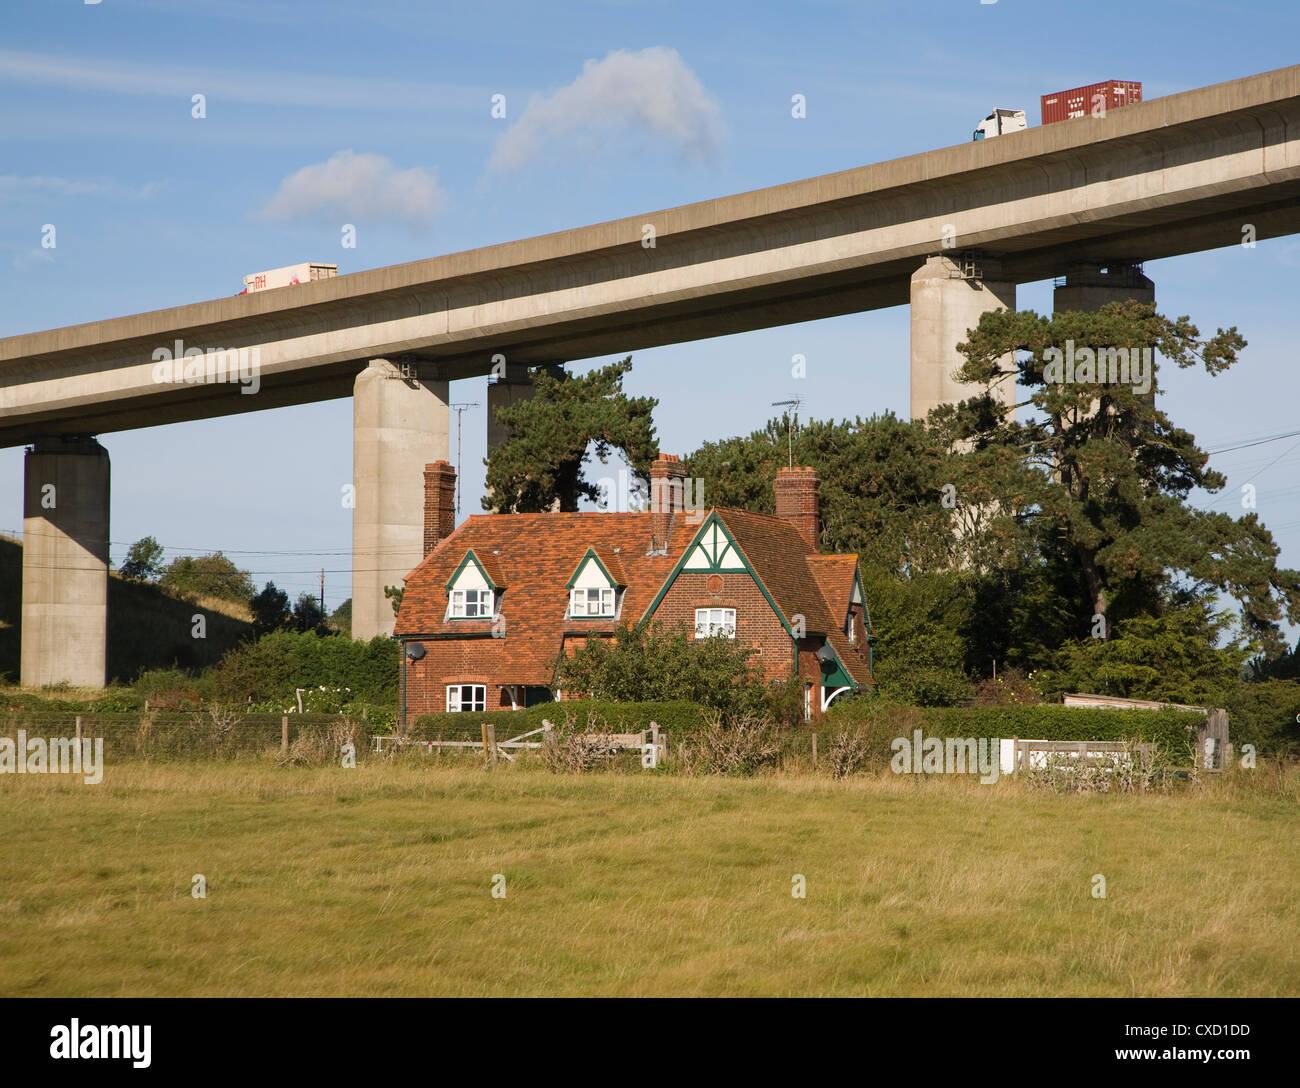 Raised A14 trunk road on Orwell Bridge above farmhouse Wherstead, Suffolk, England - Stock Image